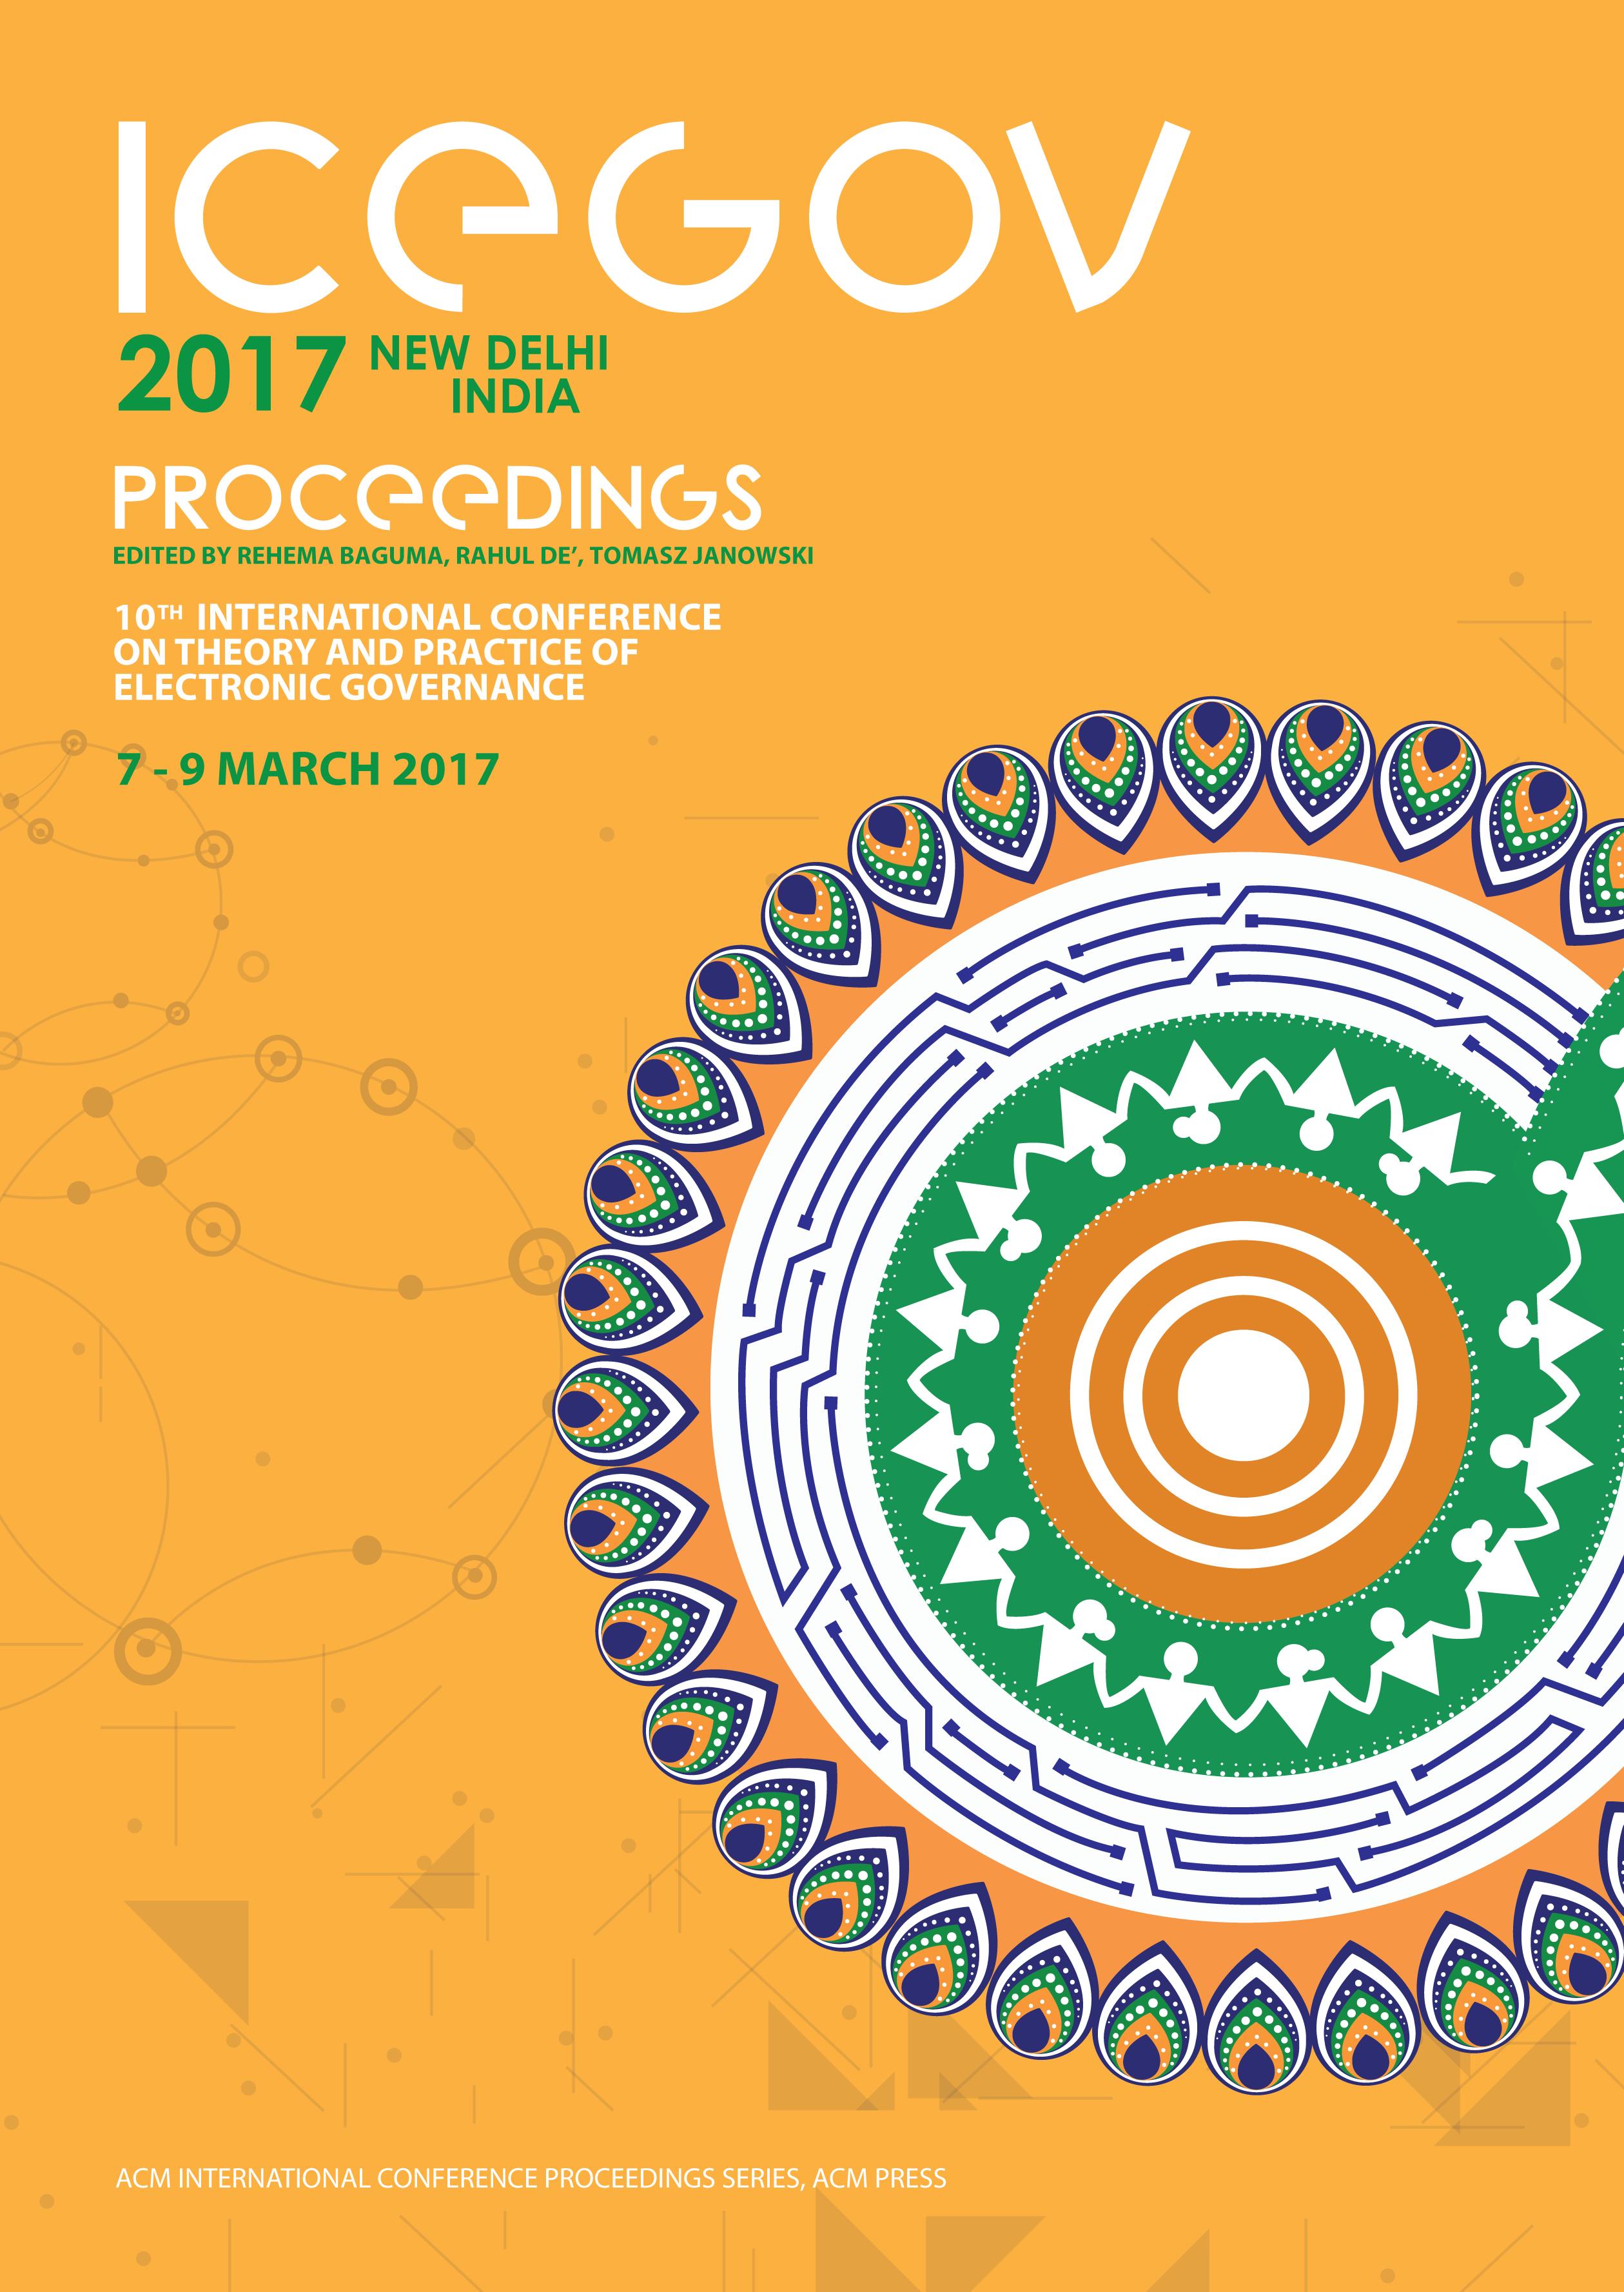 ICEGOV2017 Proceedings cover news item